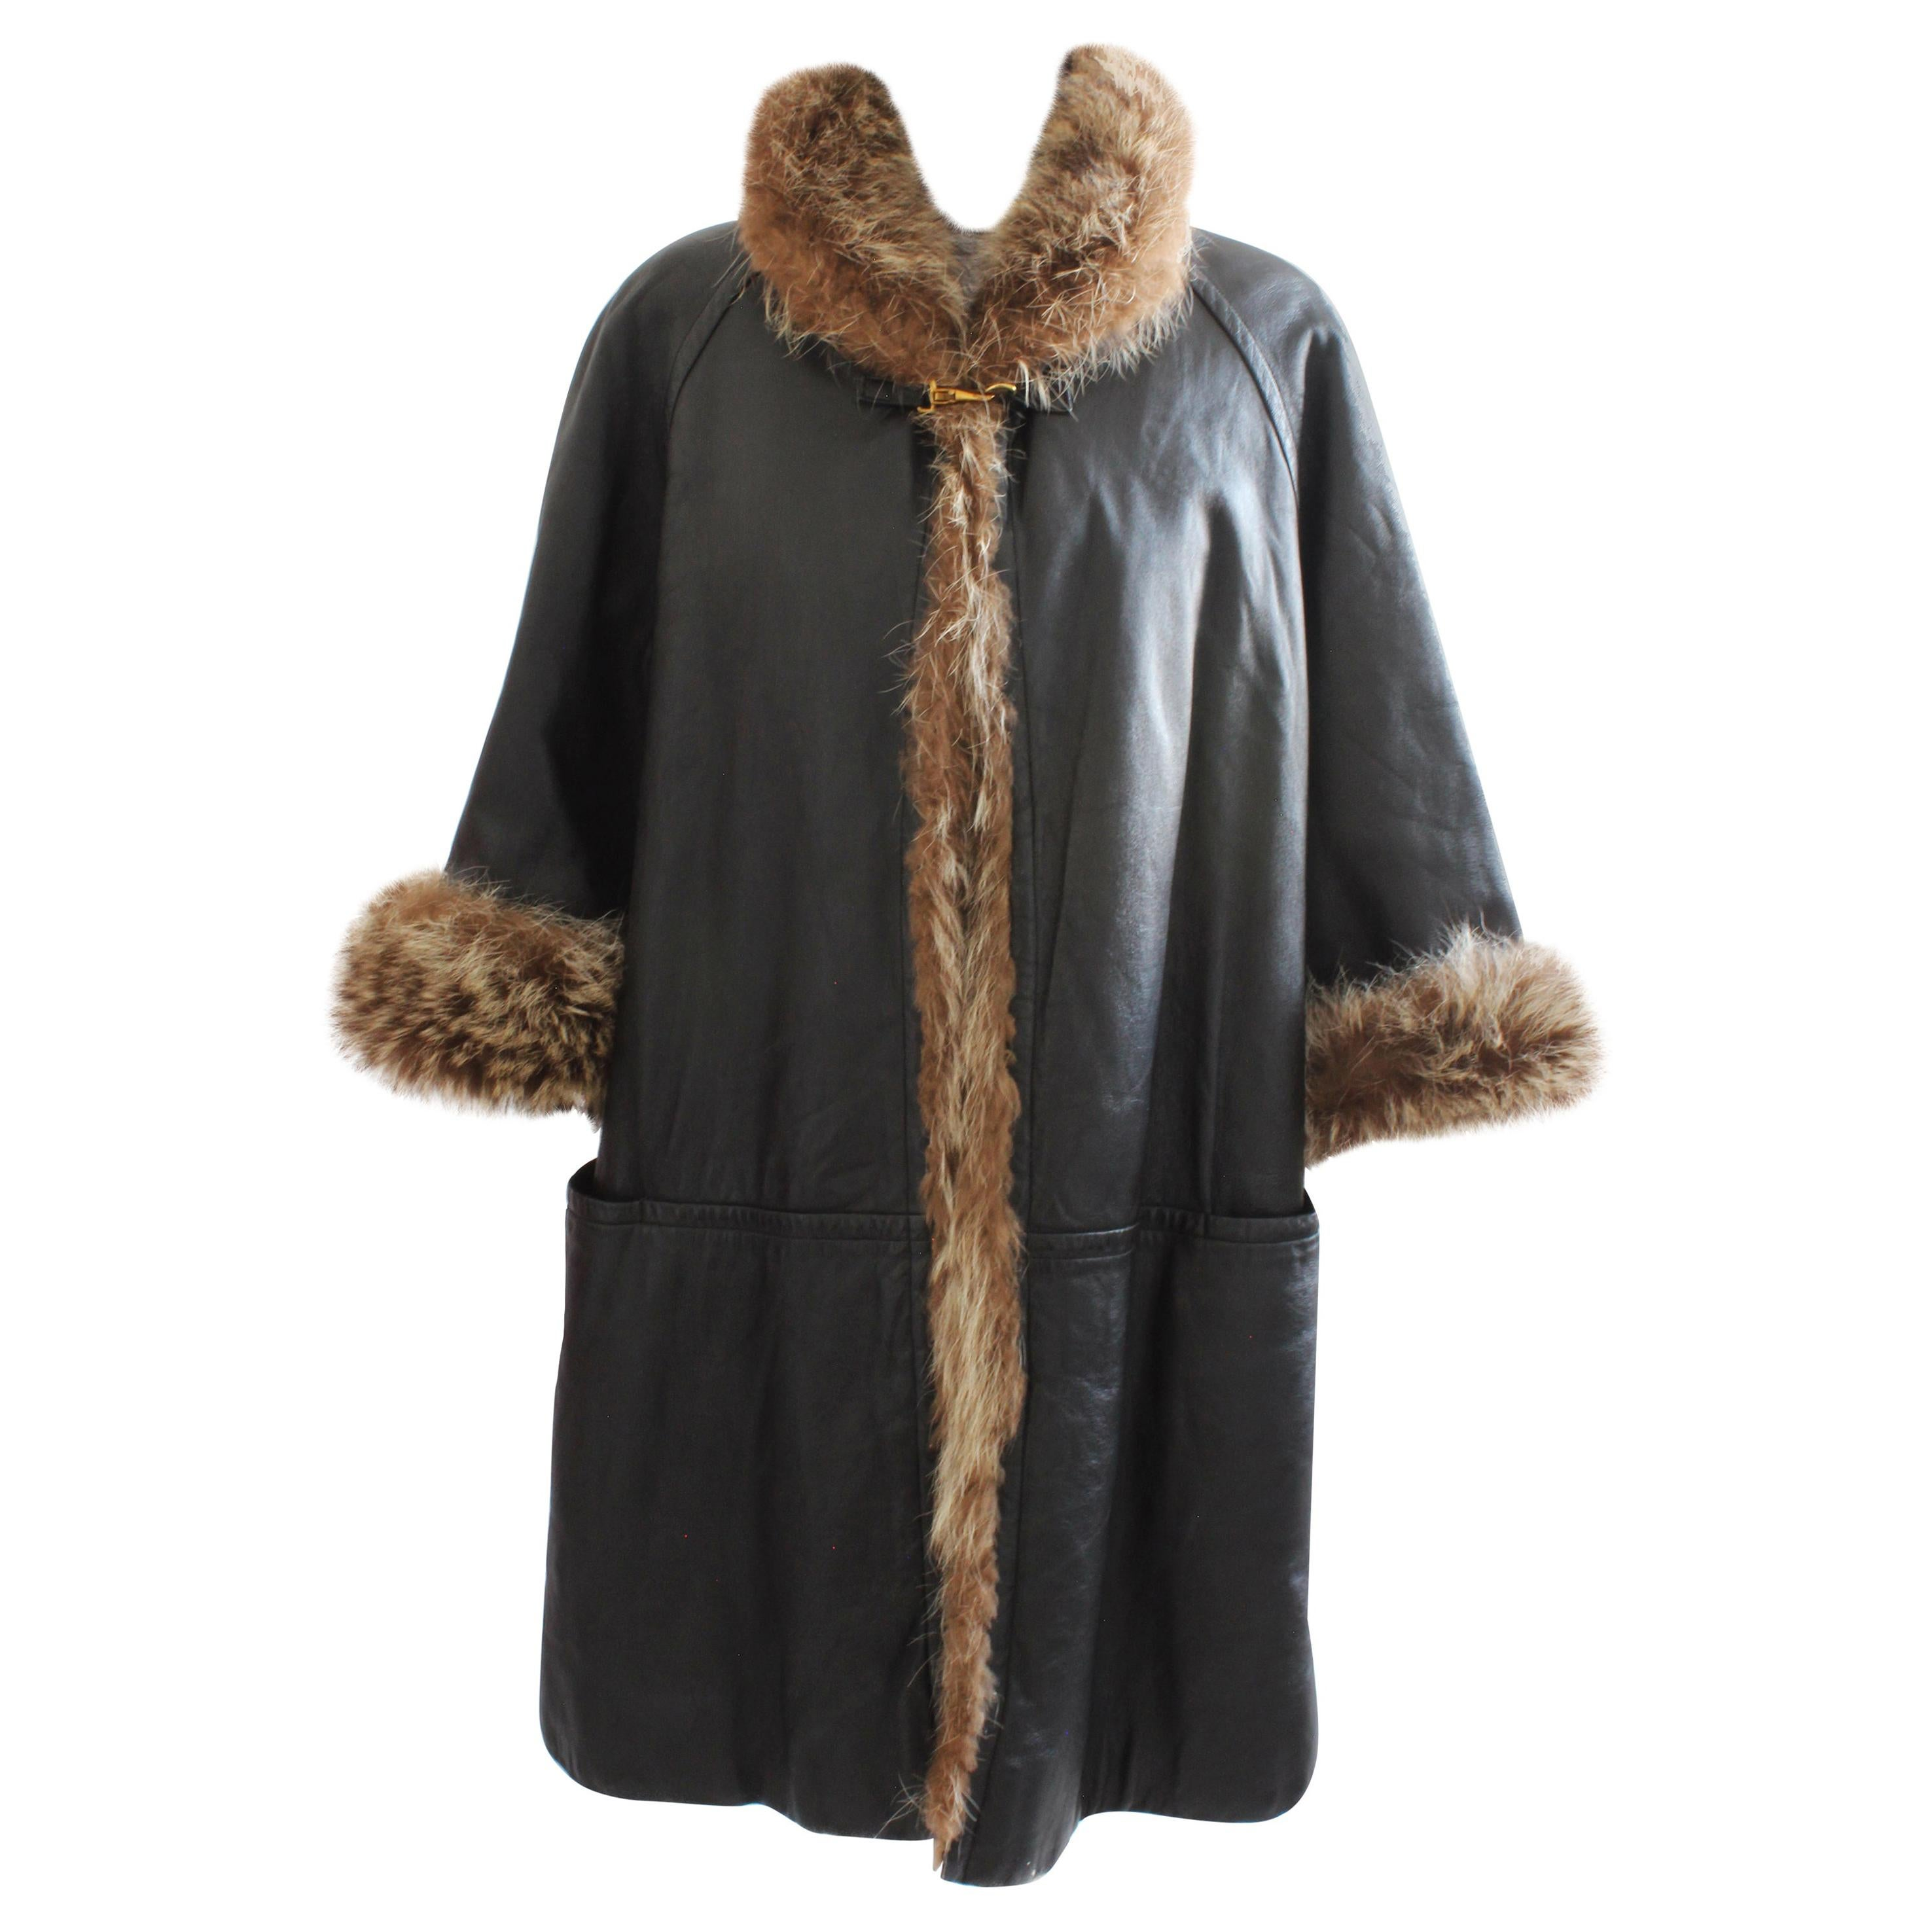 Bonnie Cashin Sills Reversible Black Leather and Raccoon Fur Coat 1960s